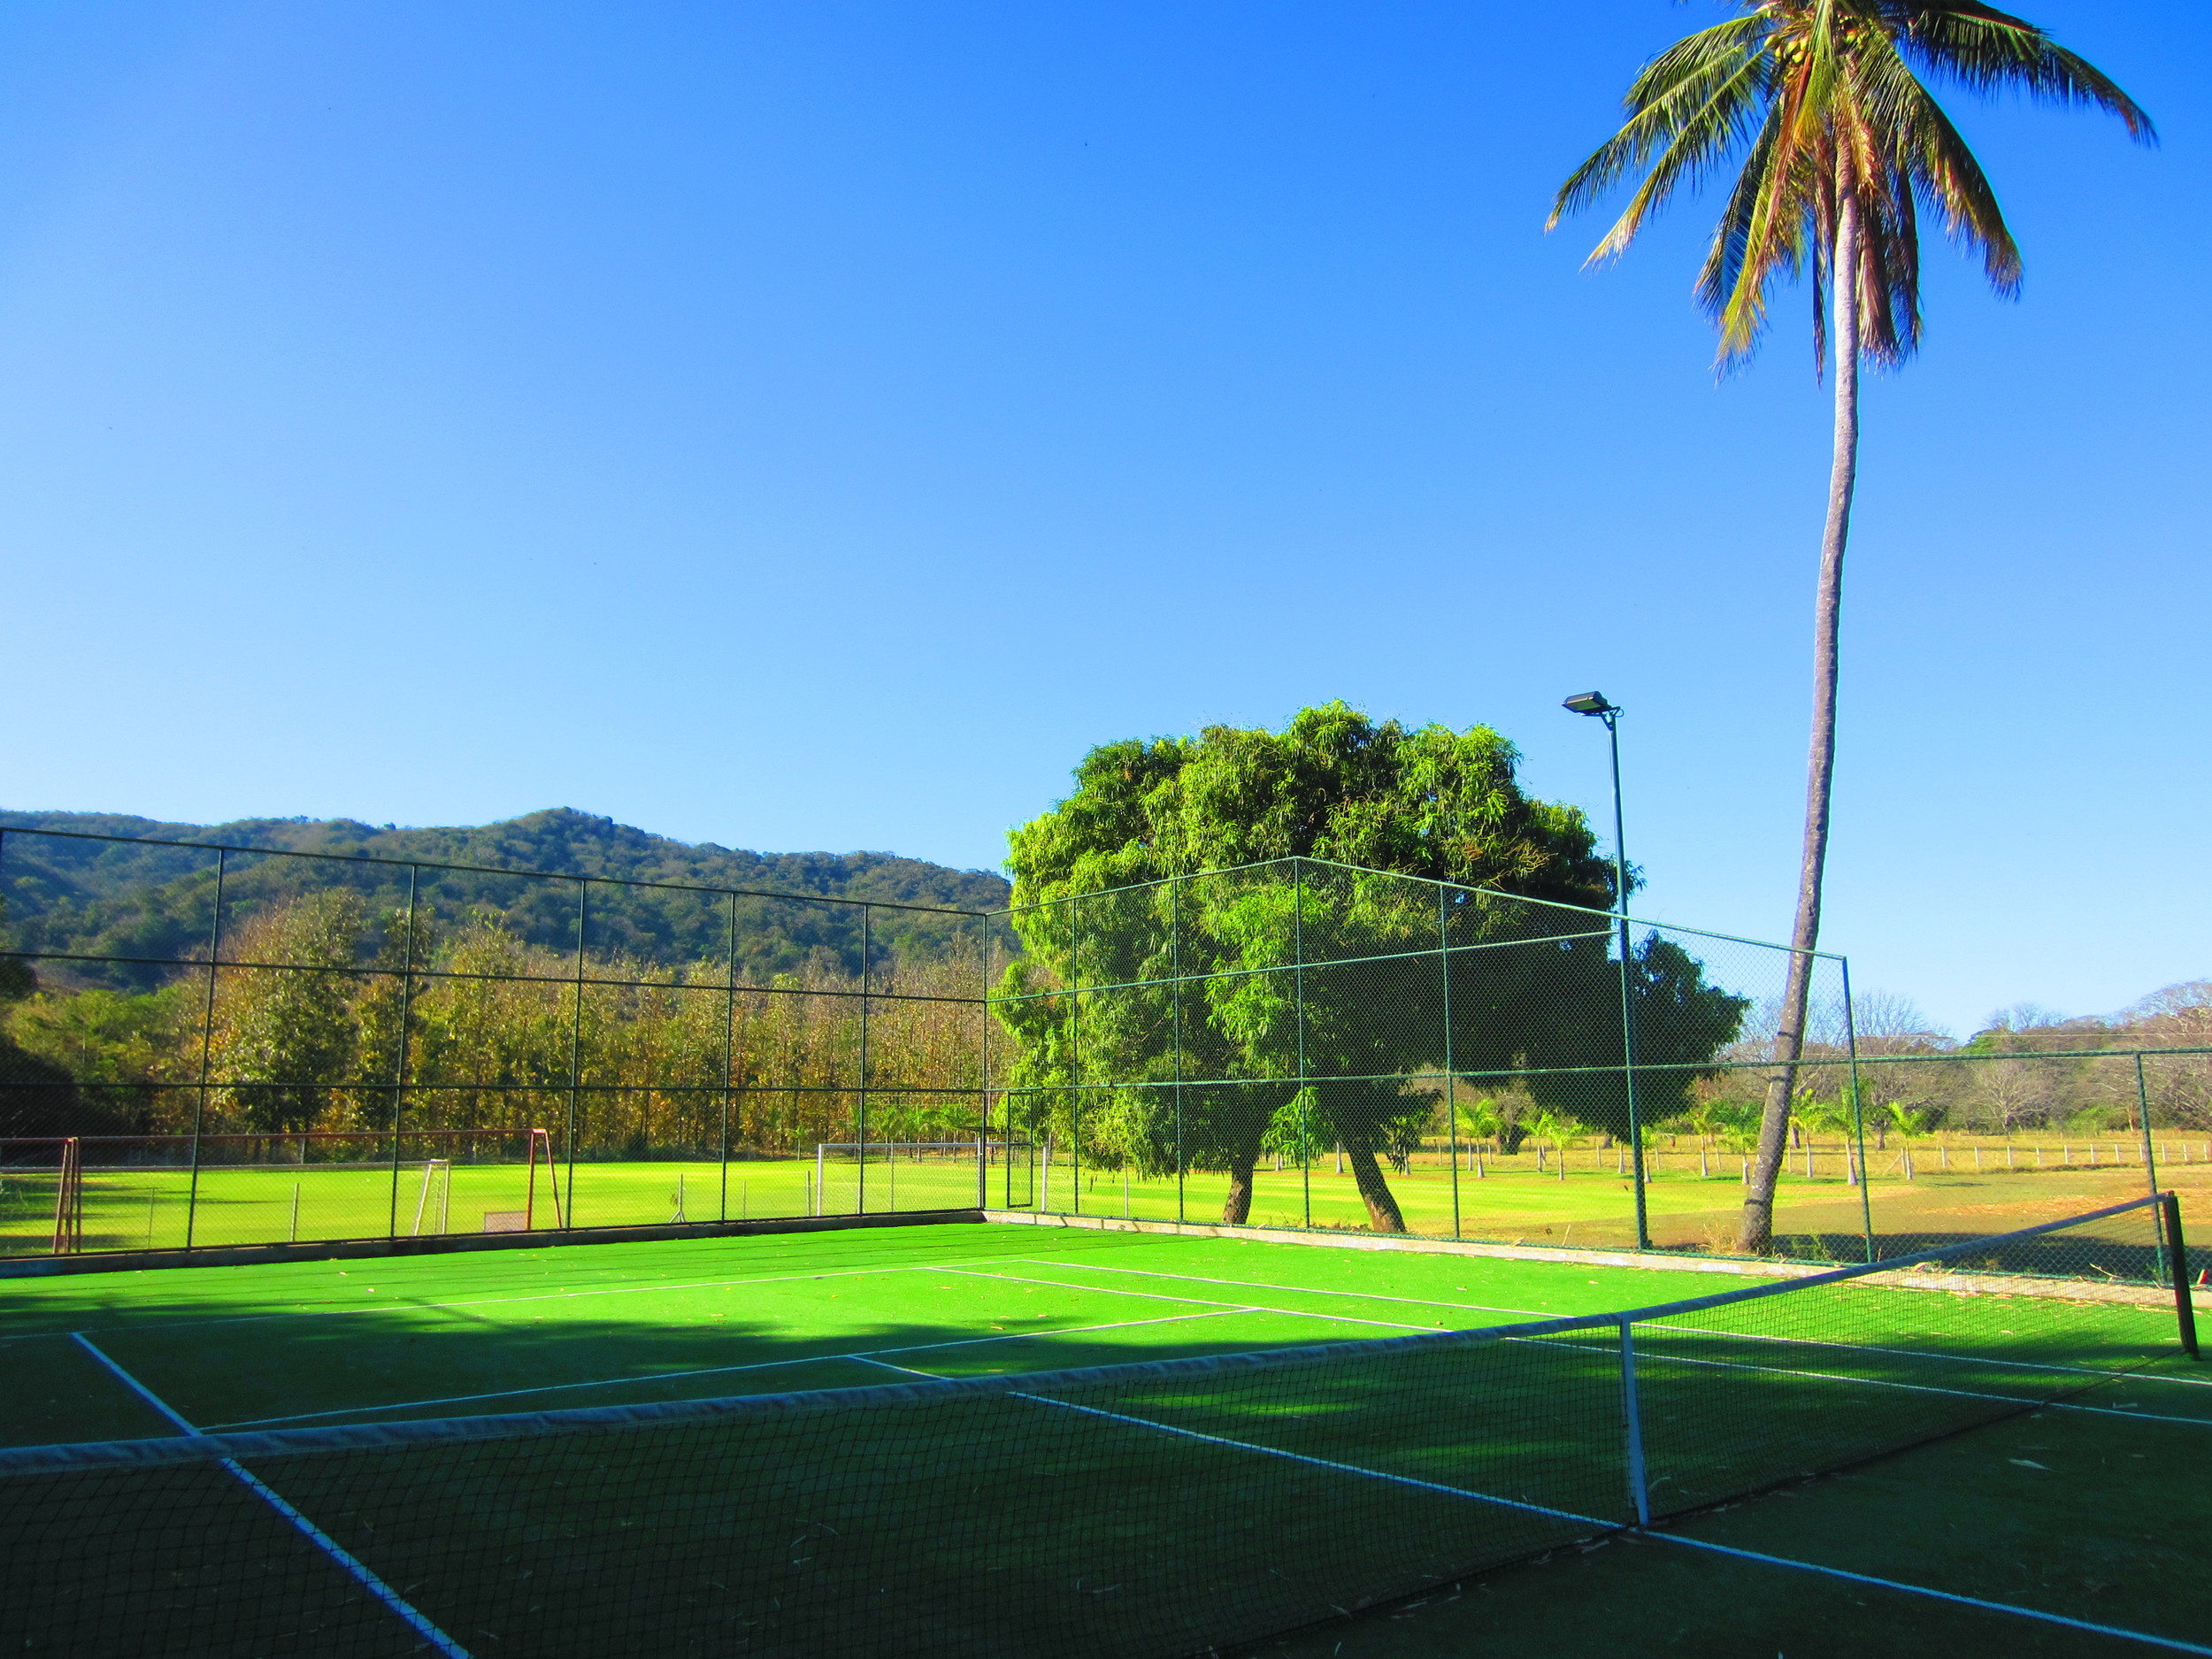 FincaAustria_tennis_court-1.JPG